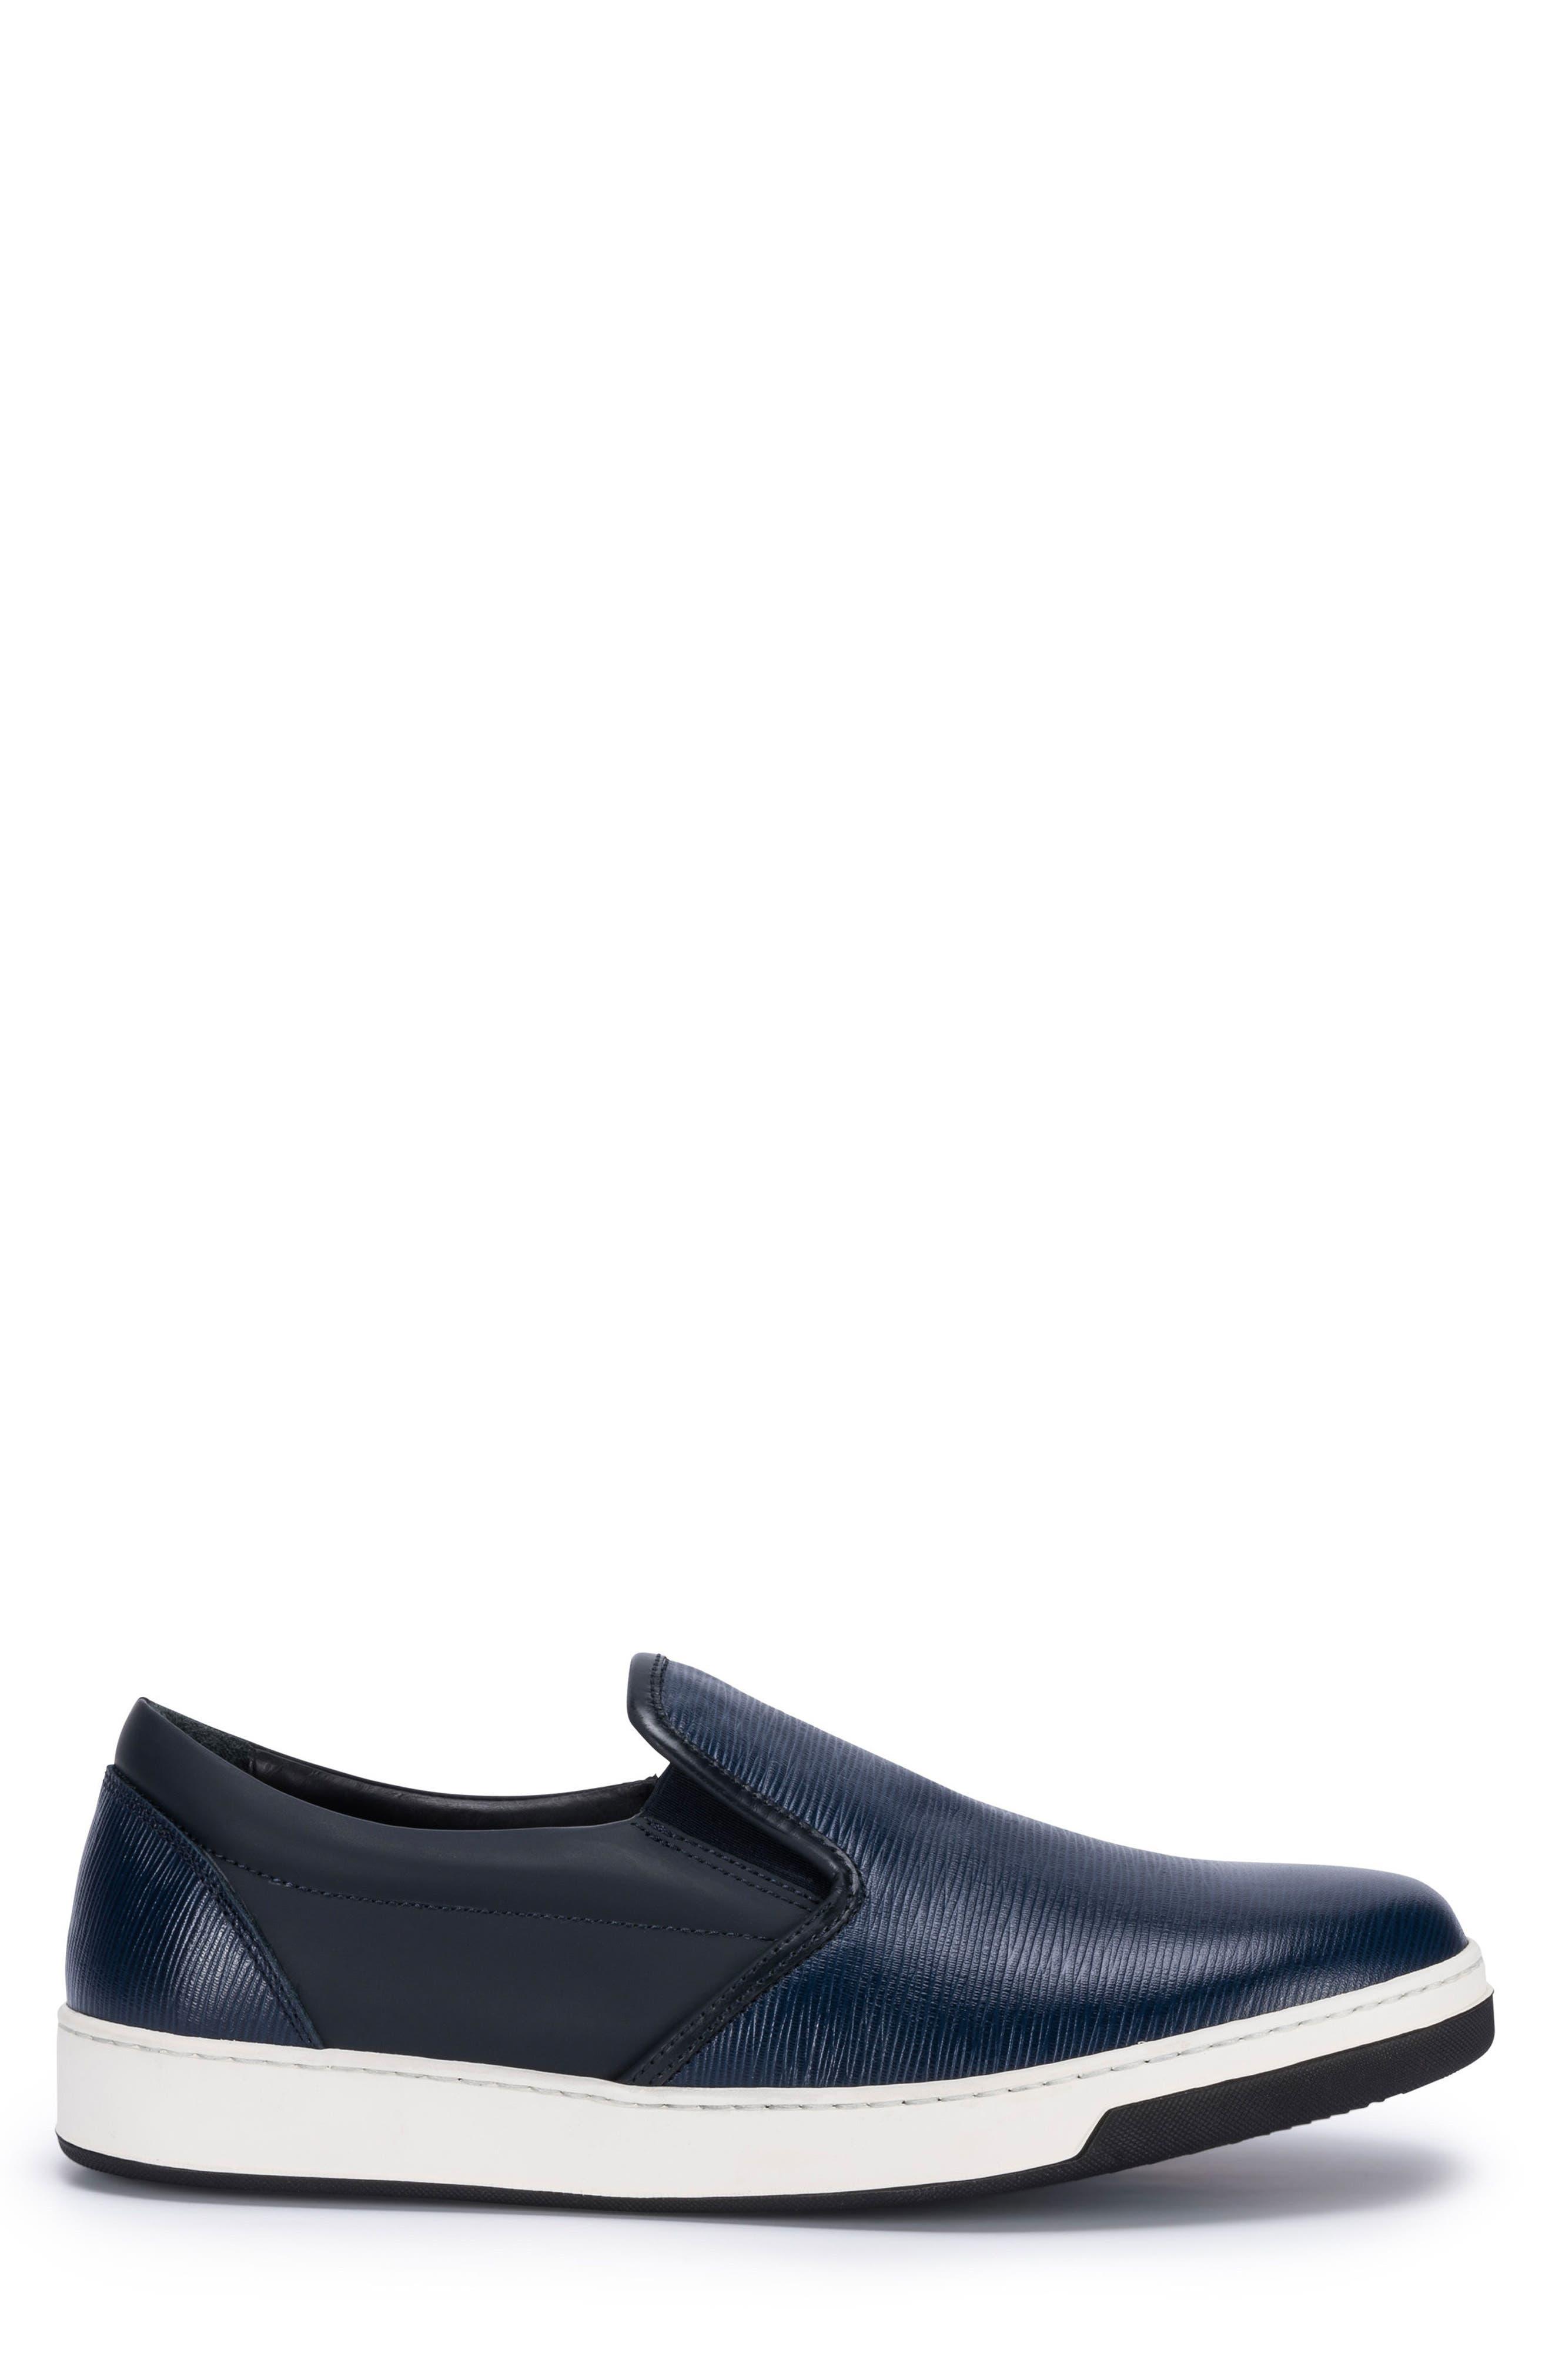 Alternate Image 3  - Bugatchi Santorini Slip-On Sneaker (Men)